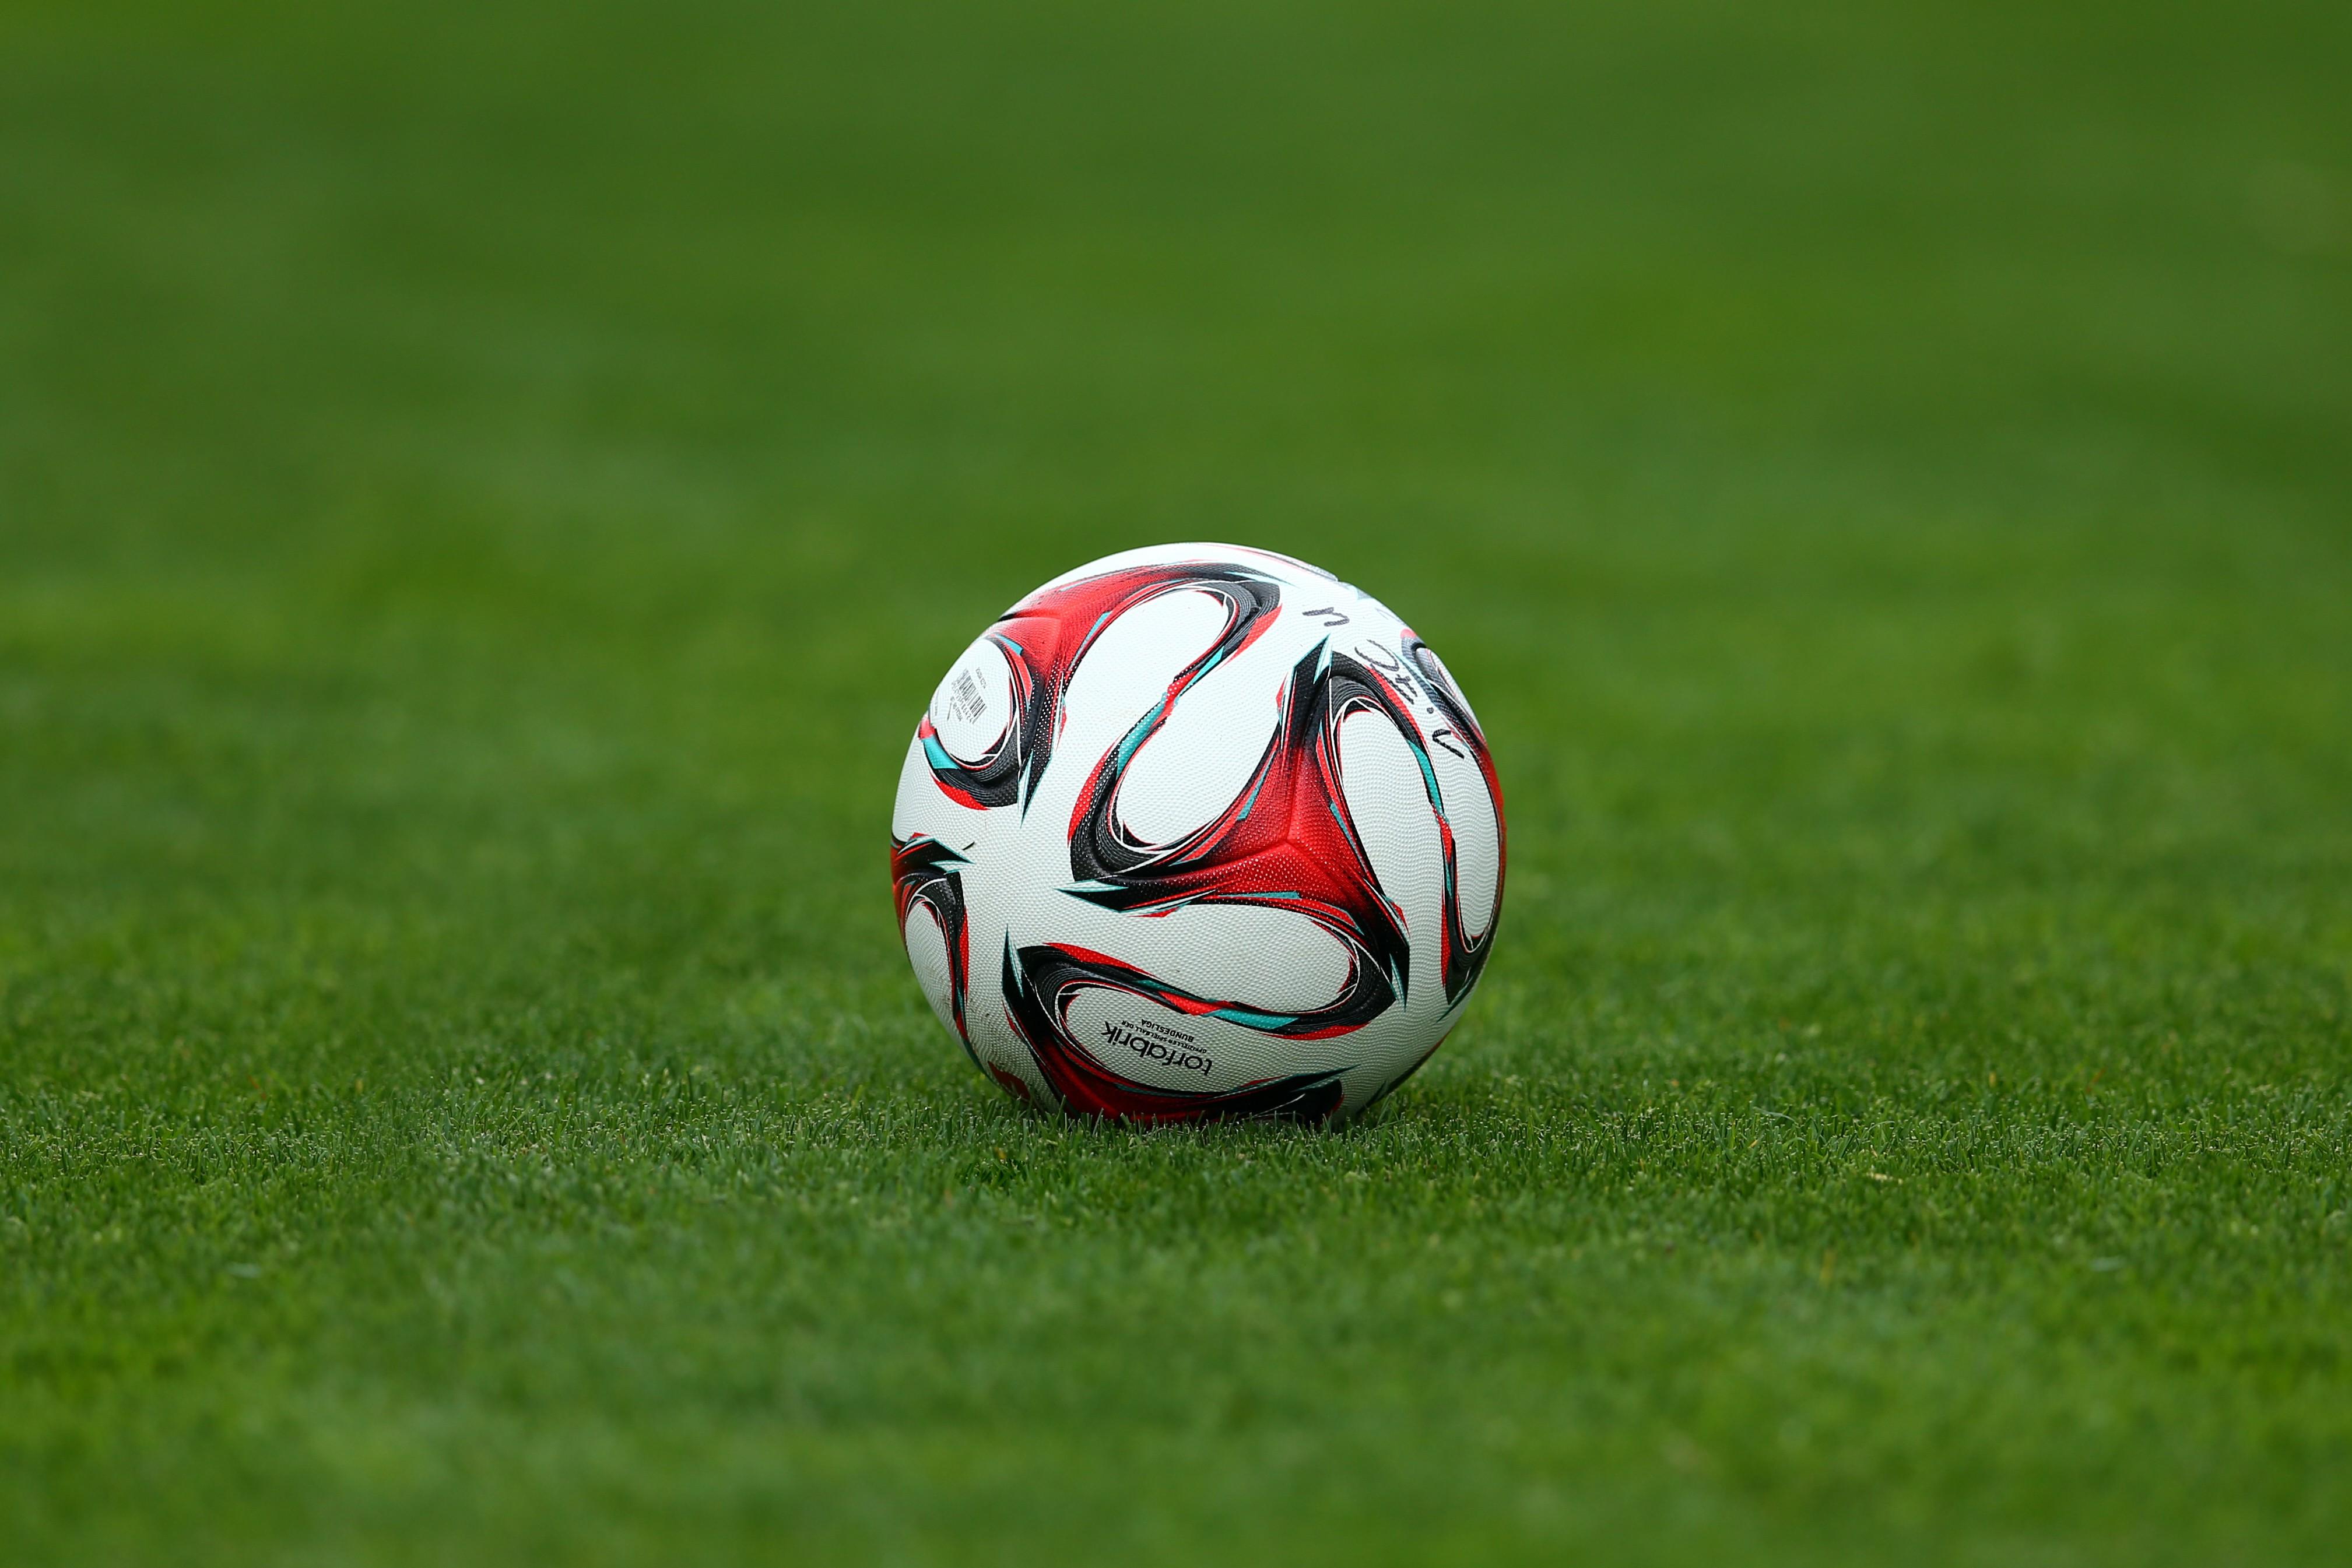 Montagsspiele Bundesliga Sky